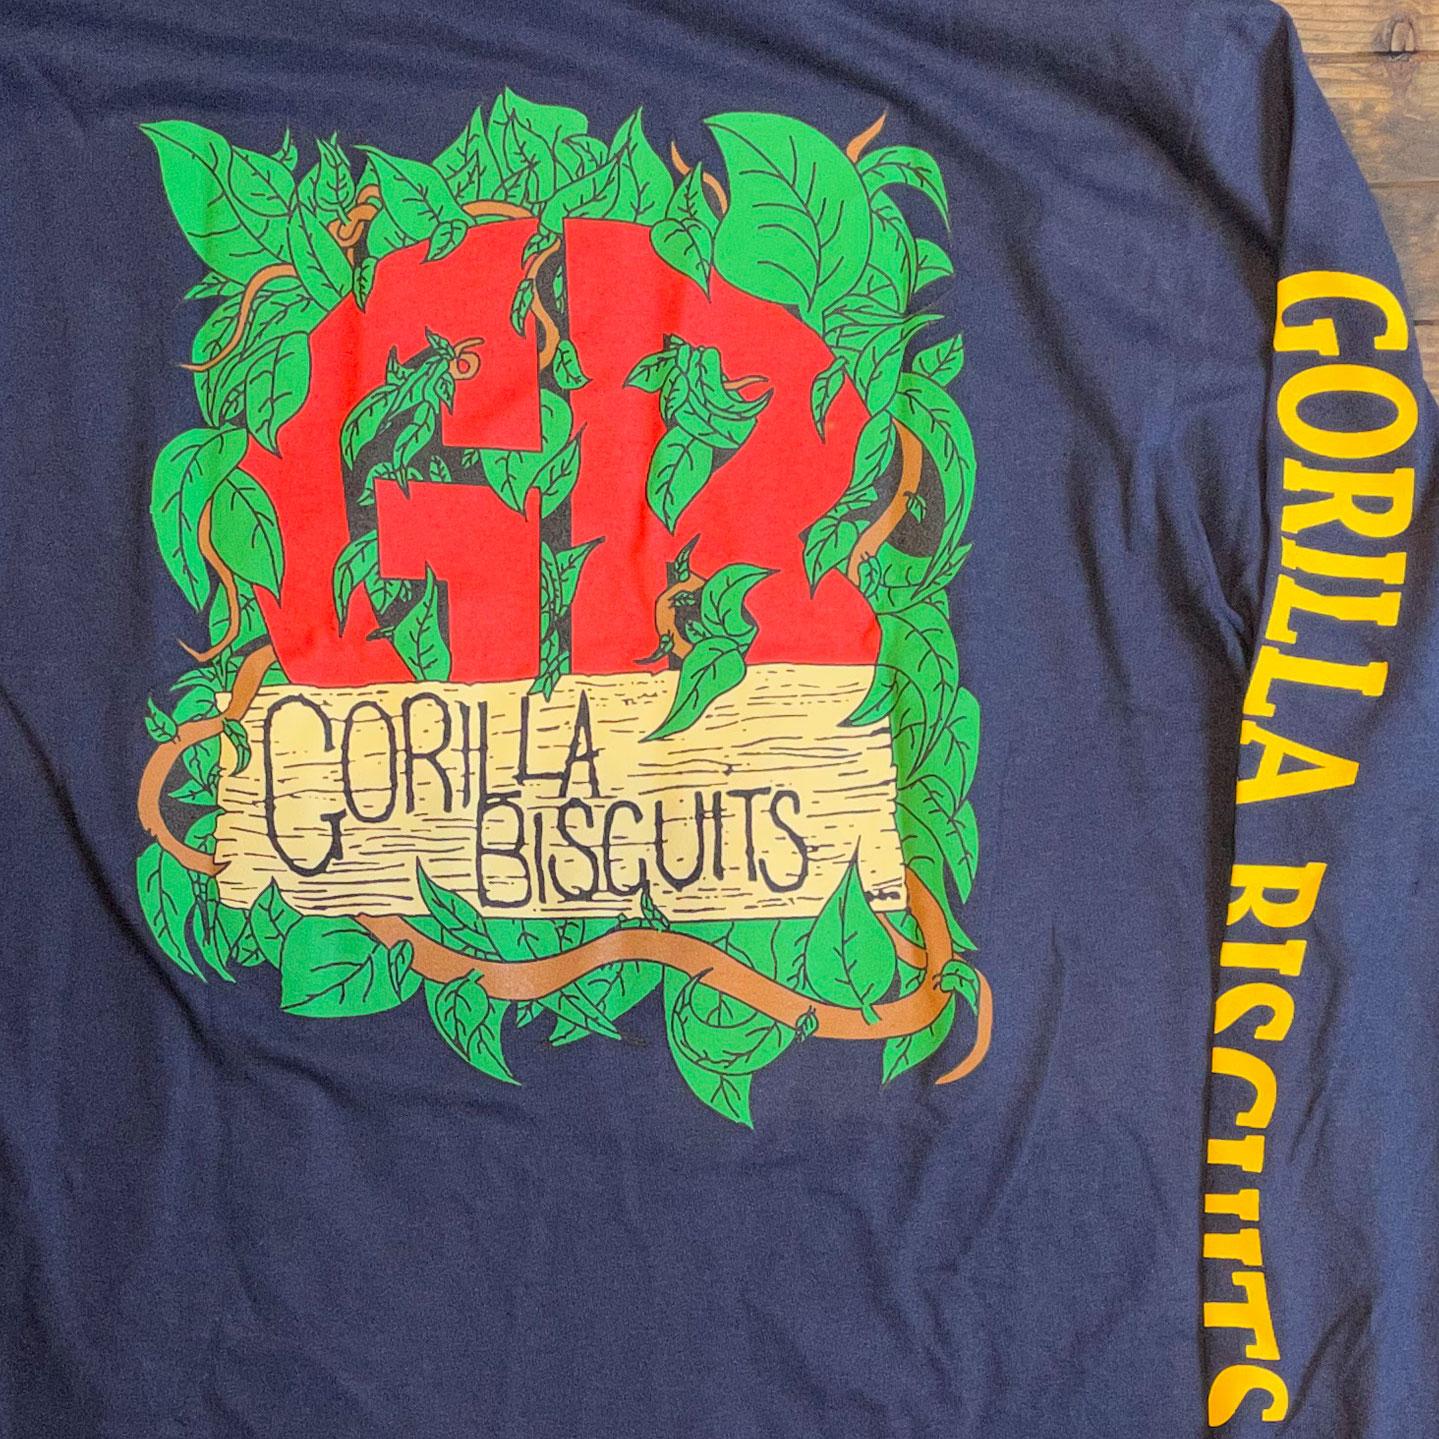 GORILLA BISCUITS ロングスリーブTシャツ